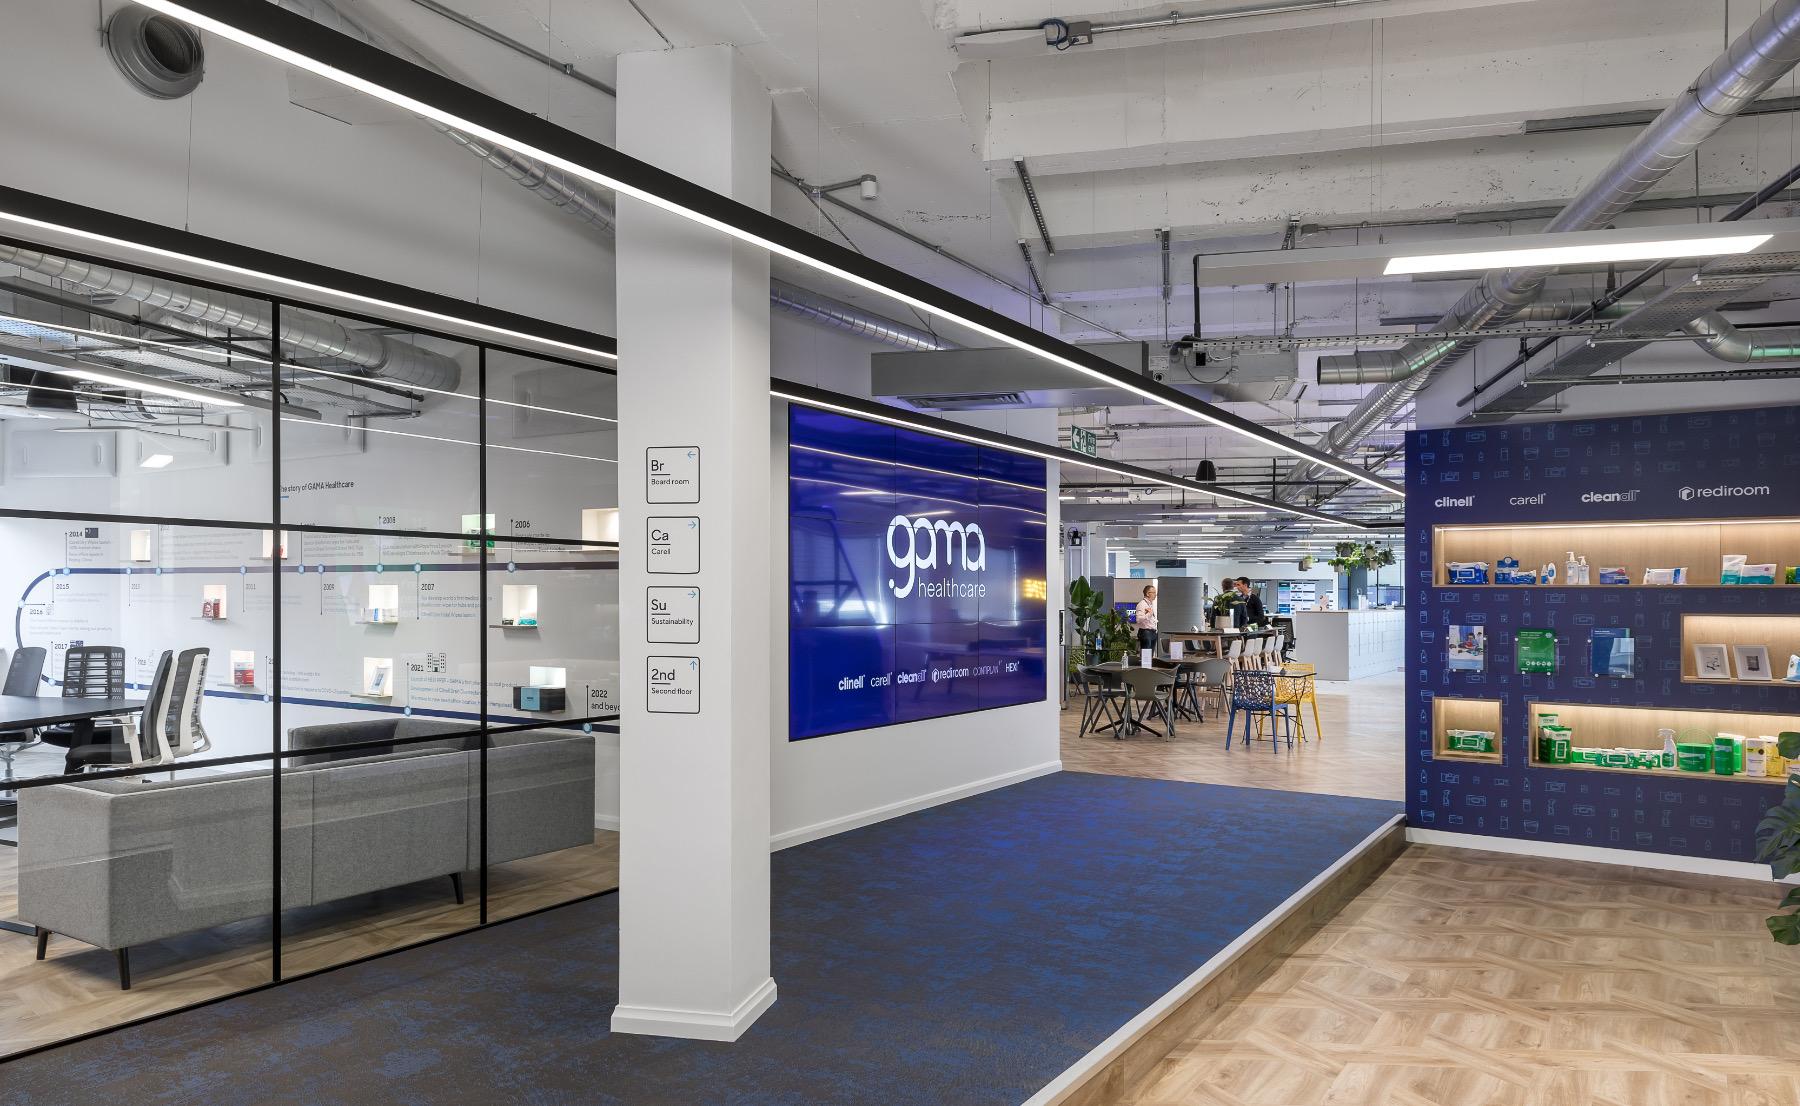 gama-healthcare-office-m